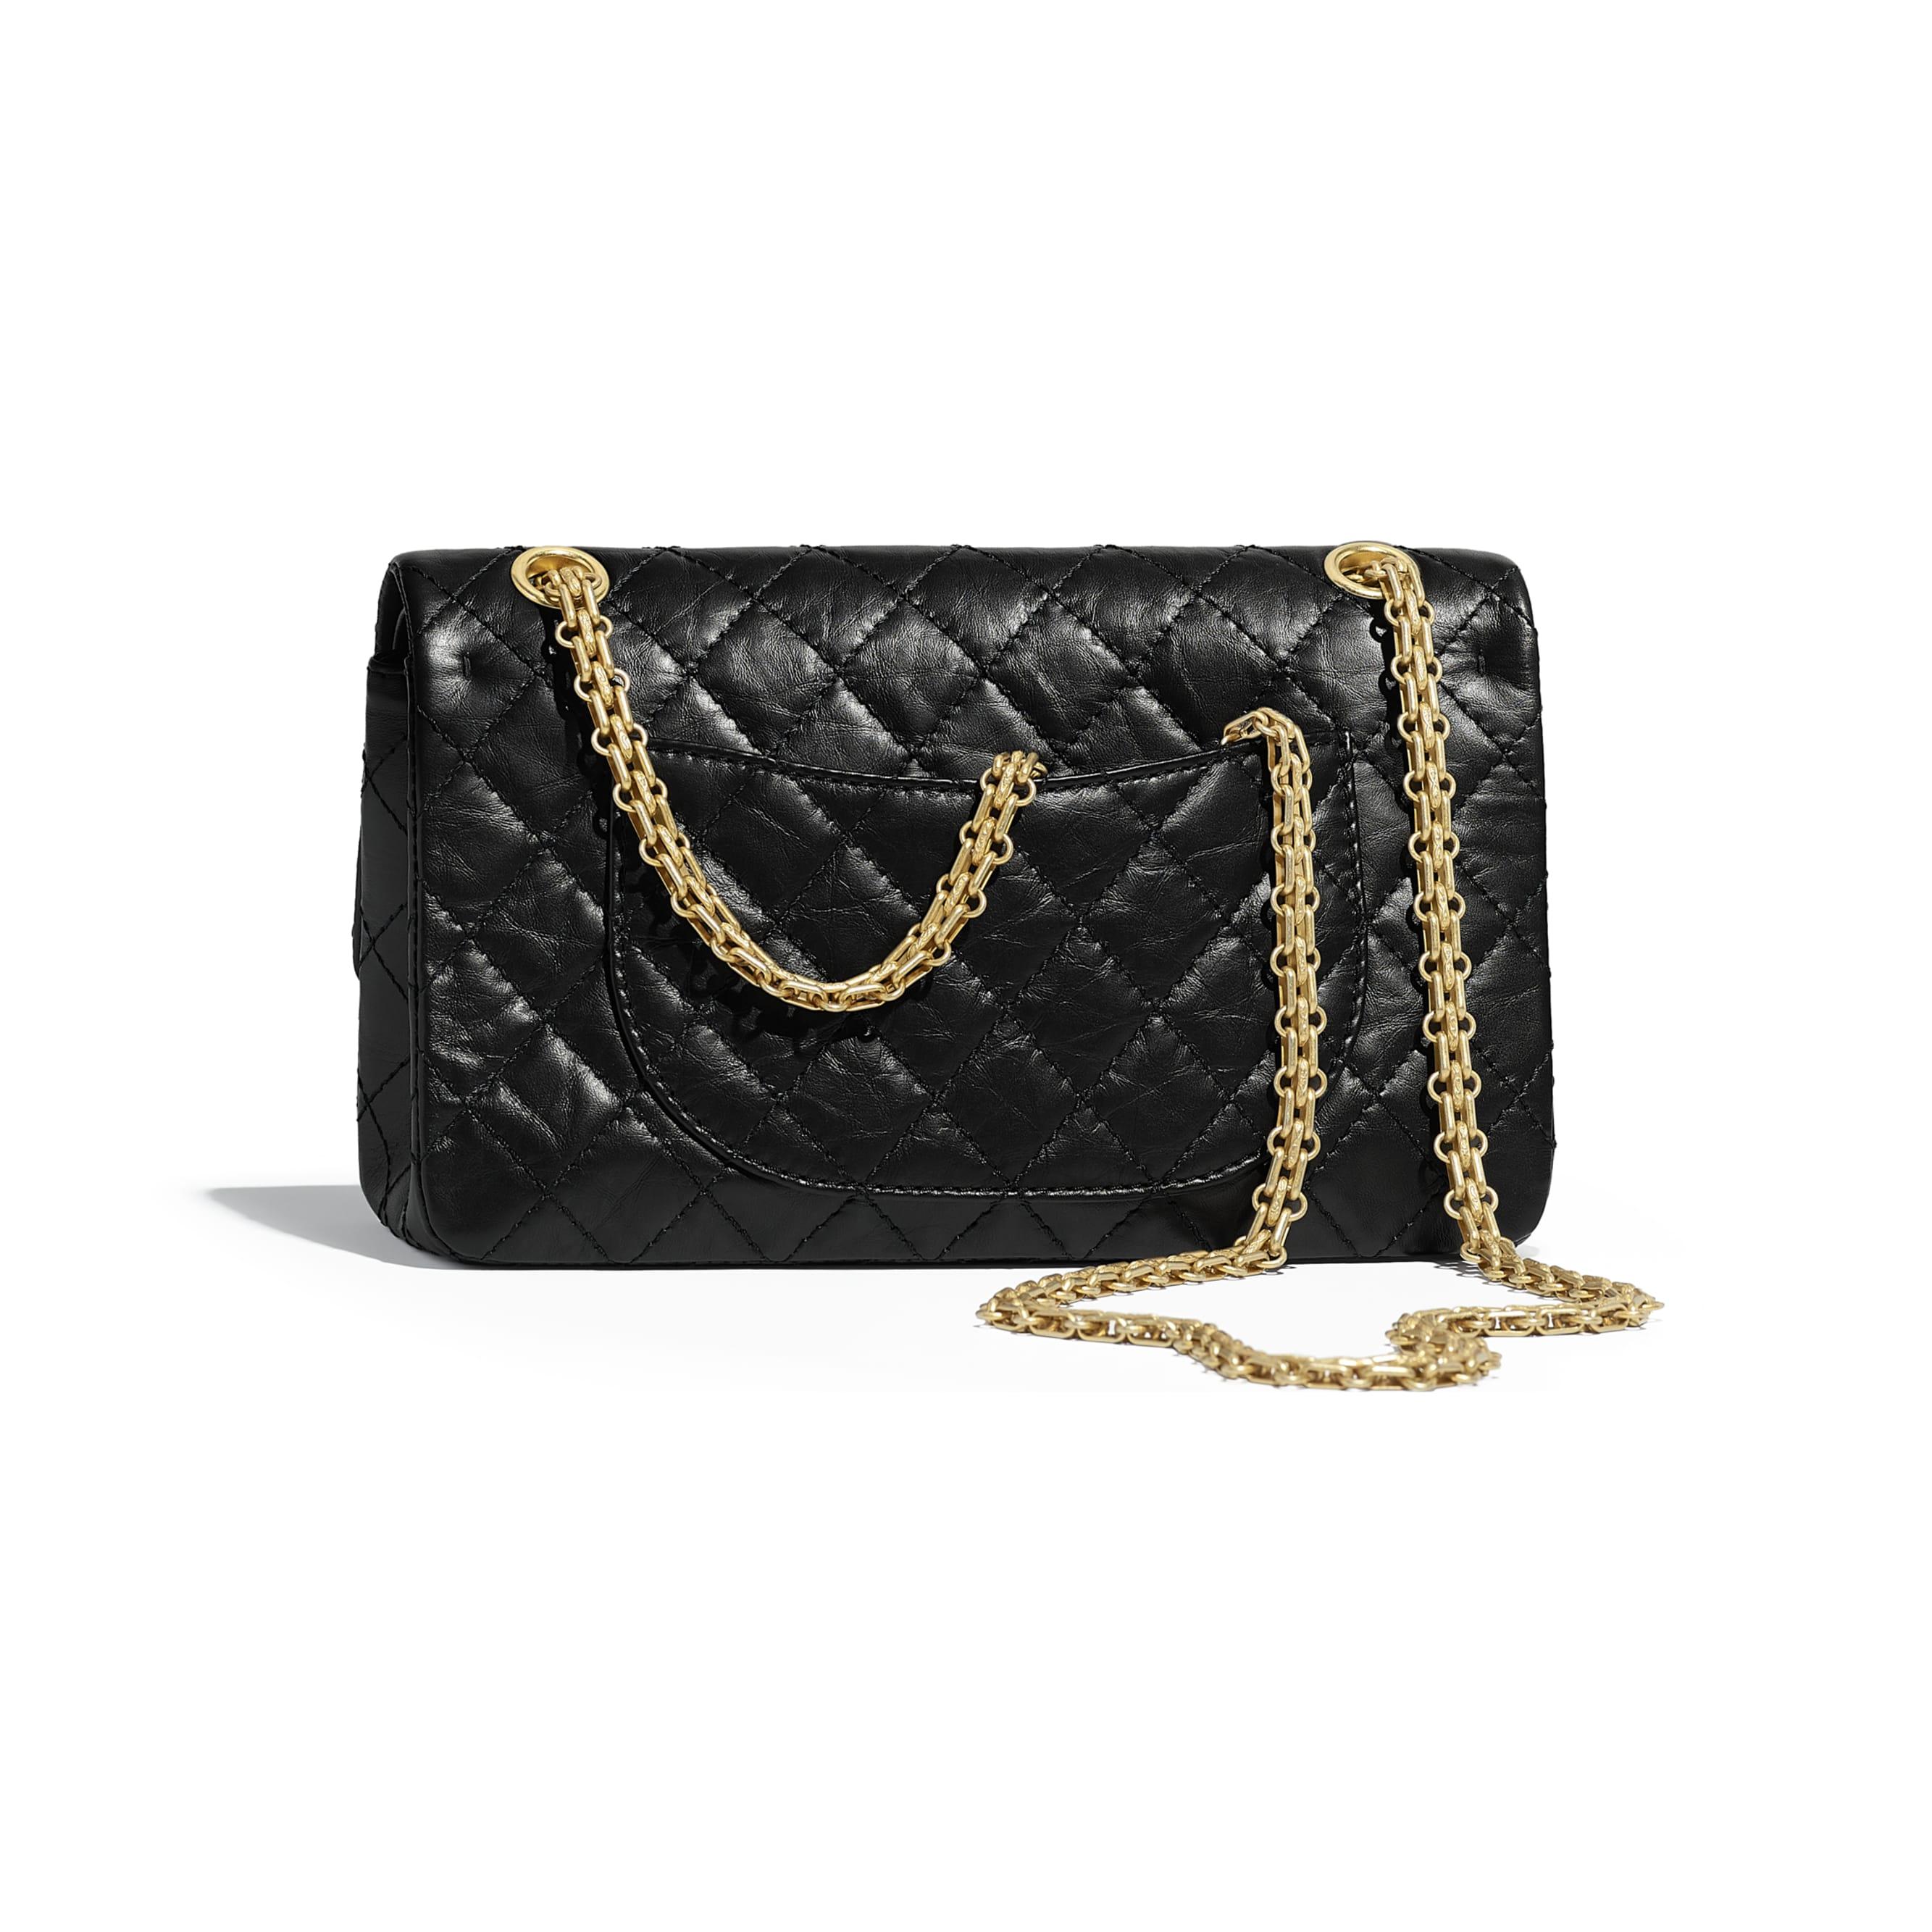 2.55 Handbag - Black - Aged Calfskin, Charms & Gold-Tone Metal - Alternative view - see standard sized version